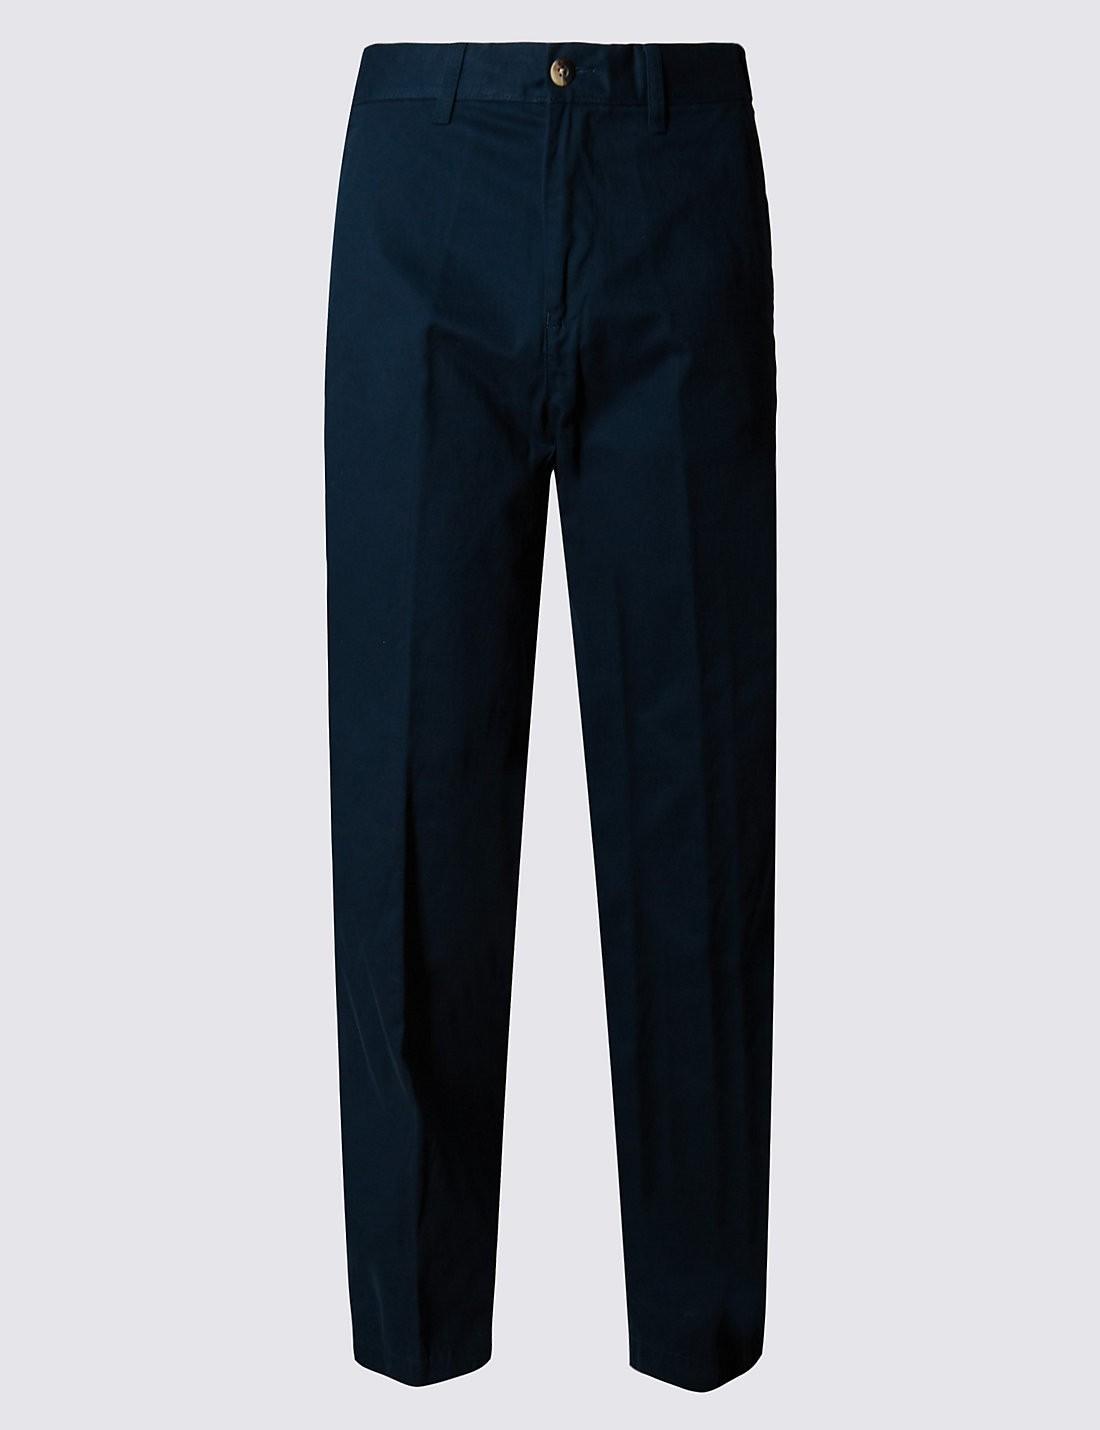 Saf Pamuklu Regular Fit Chino Pantolon